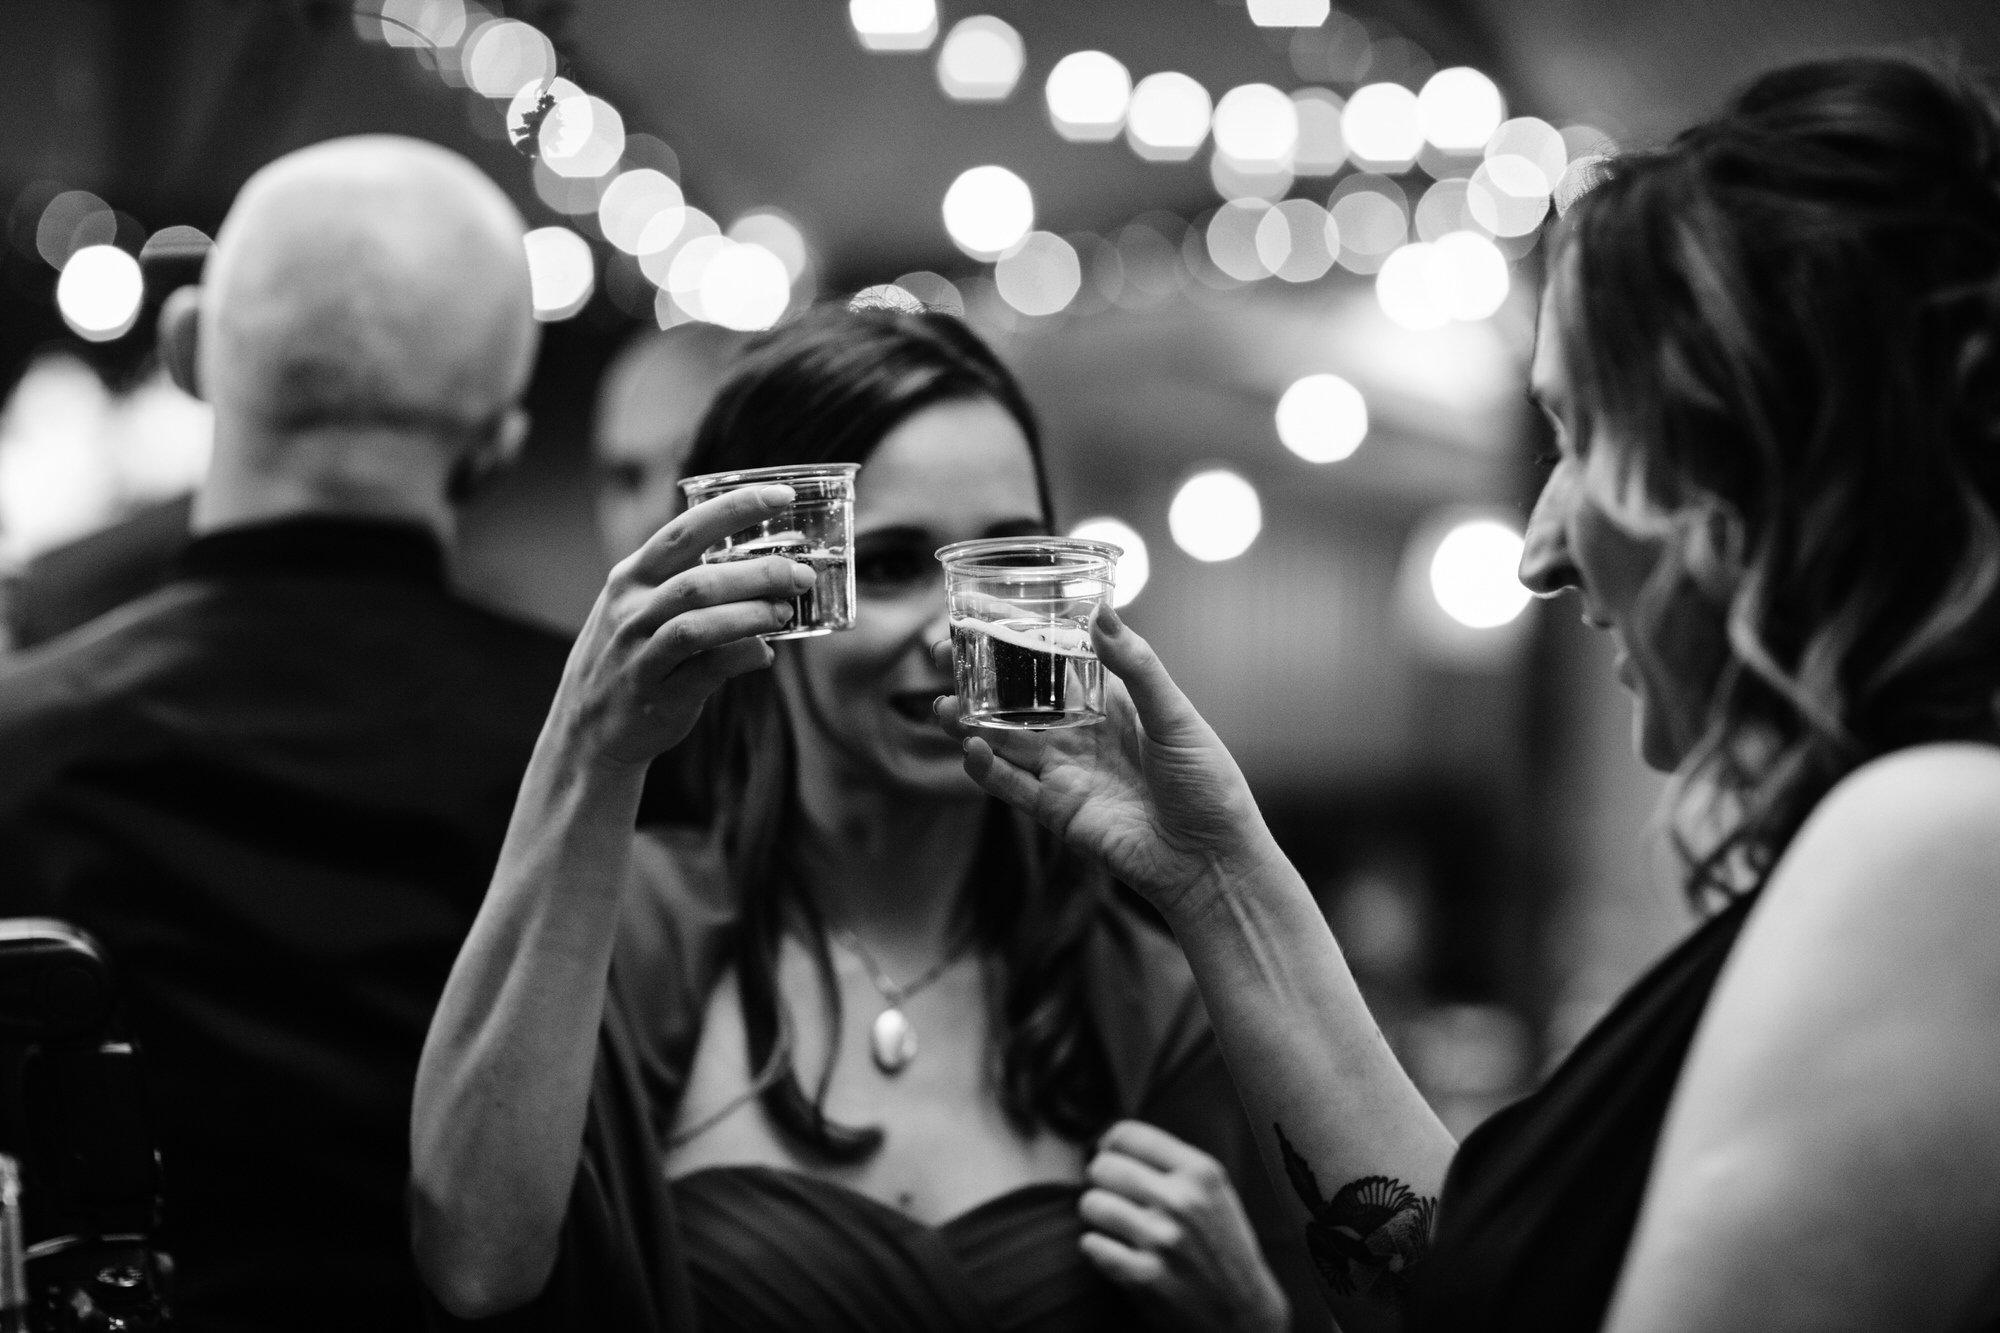 063 TIN SHED KNOCKRAICH WEDDING AUSTRIAN SCOTTISH ZOE ALEXANDRA PHOTOGRAPHY